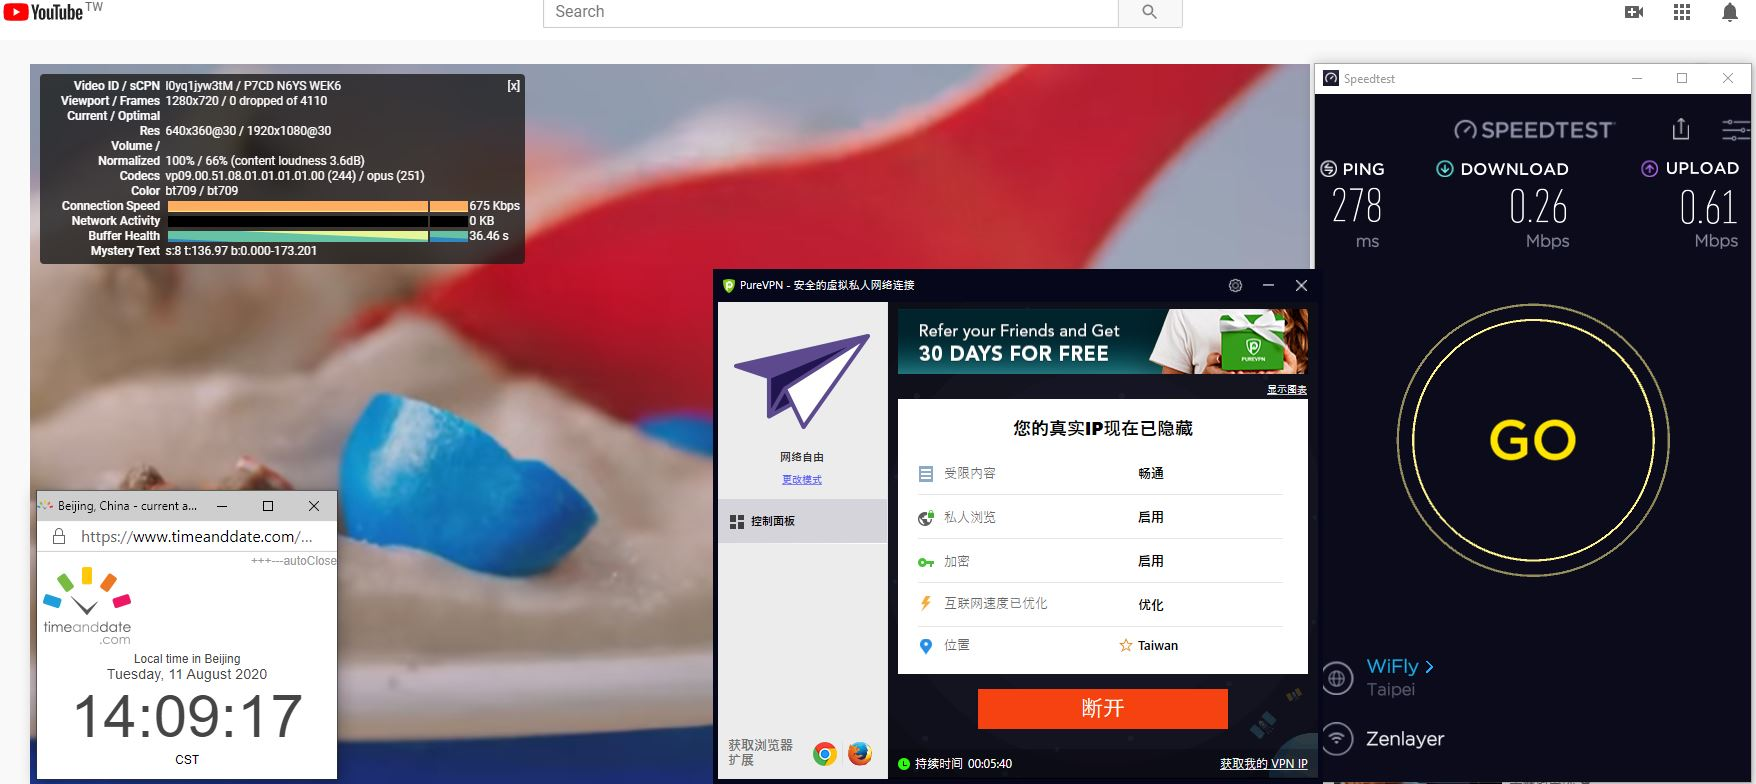 Windows10 PureVPN Taiwan 中国VPN 翻墙 科学上网 翻墙速度测试 - 20200811